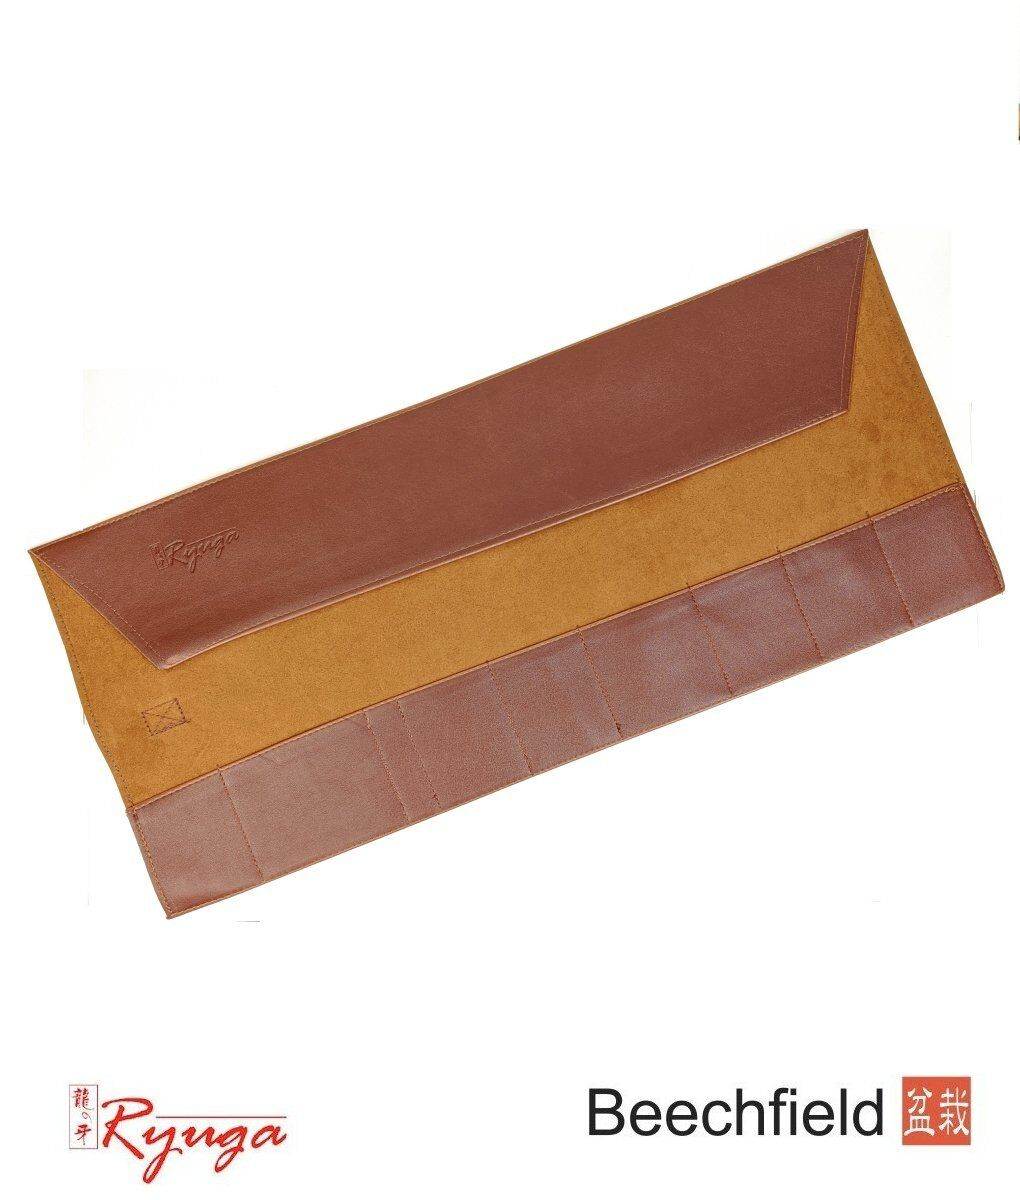 Ryuga Bonsai Tool Roll Beechfield Bonsai